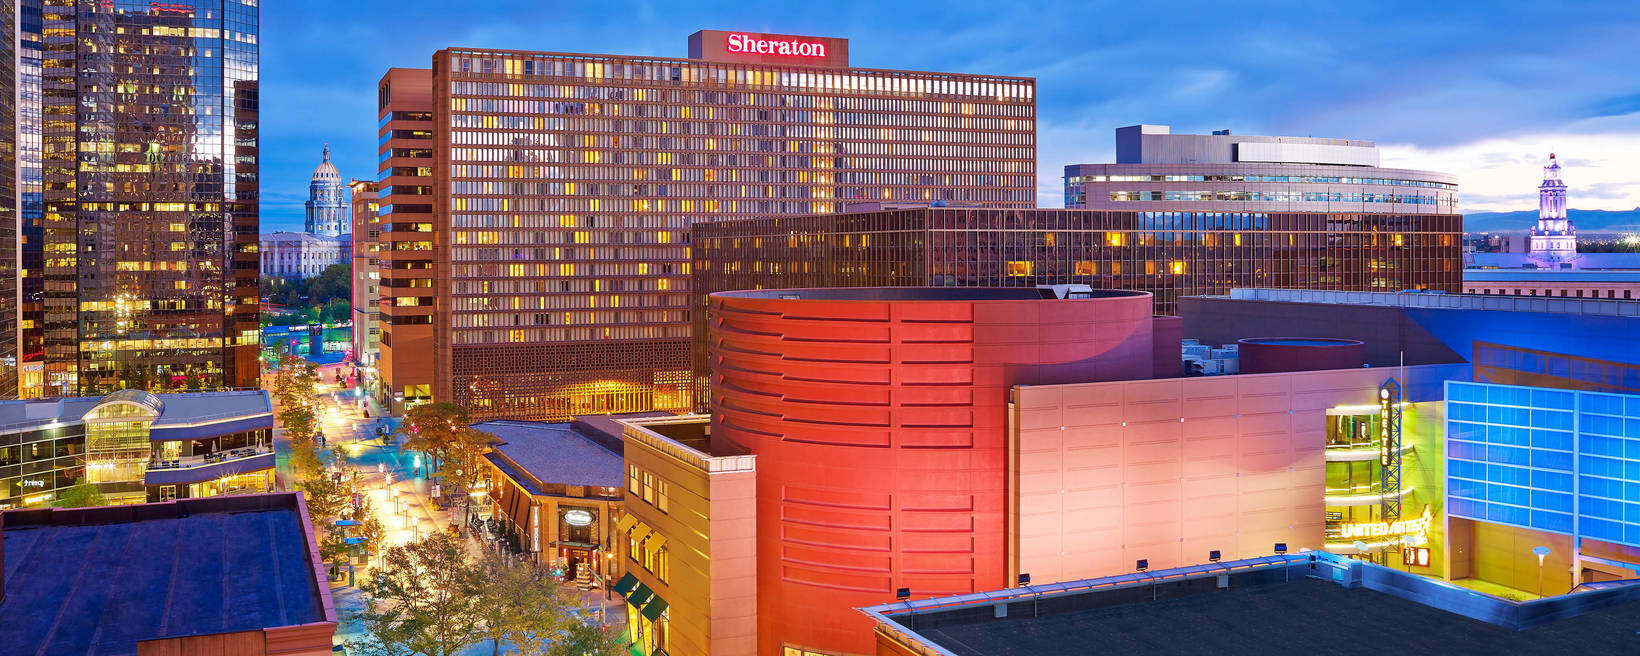 420 Friendly Hotels Downtown Denver